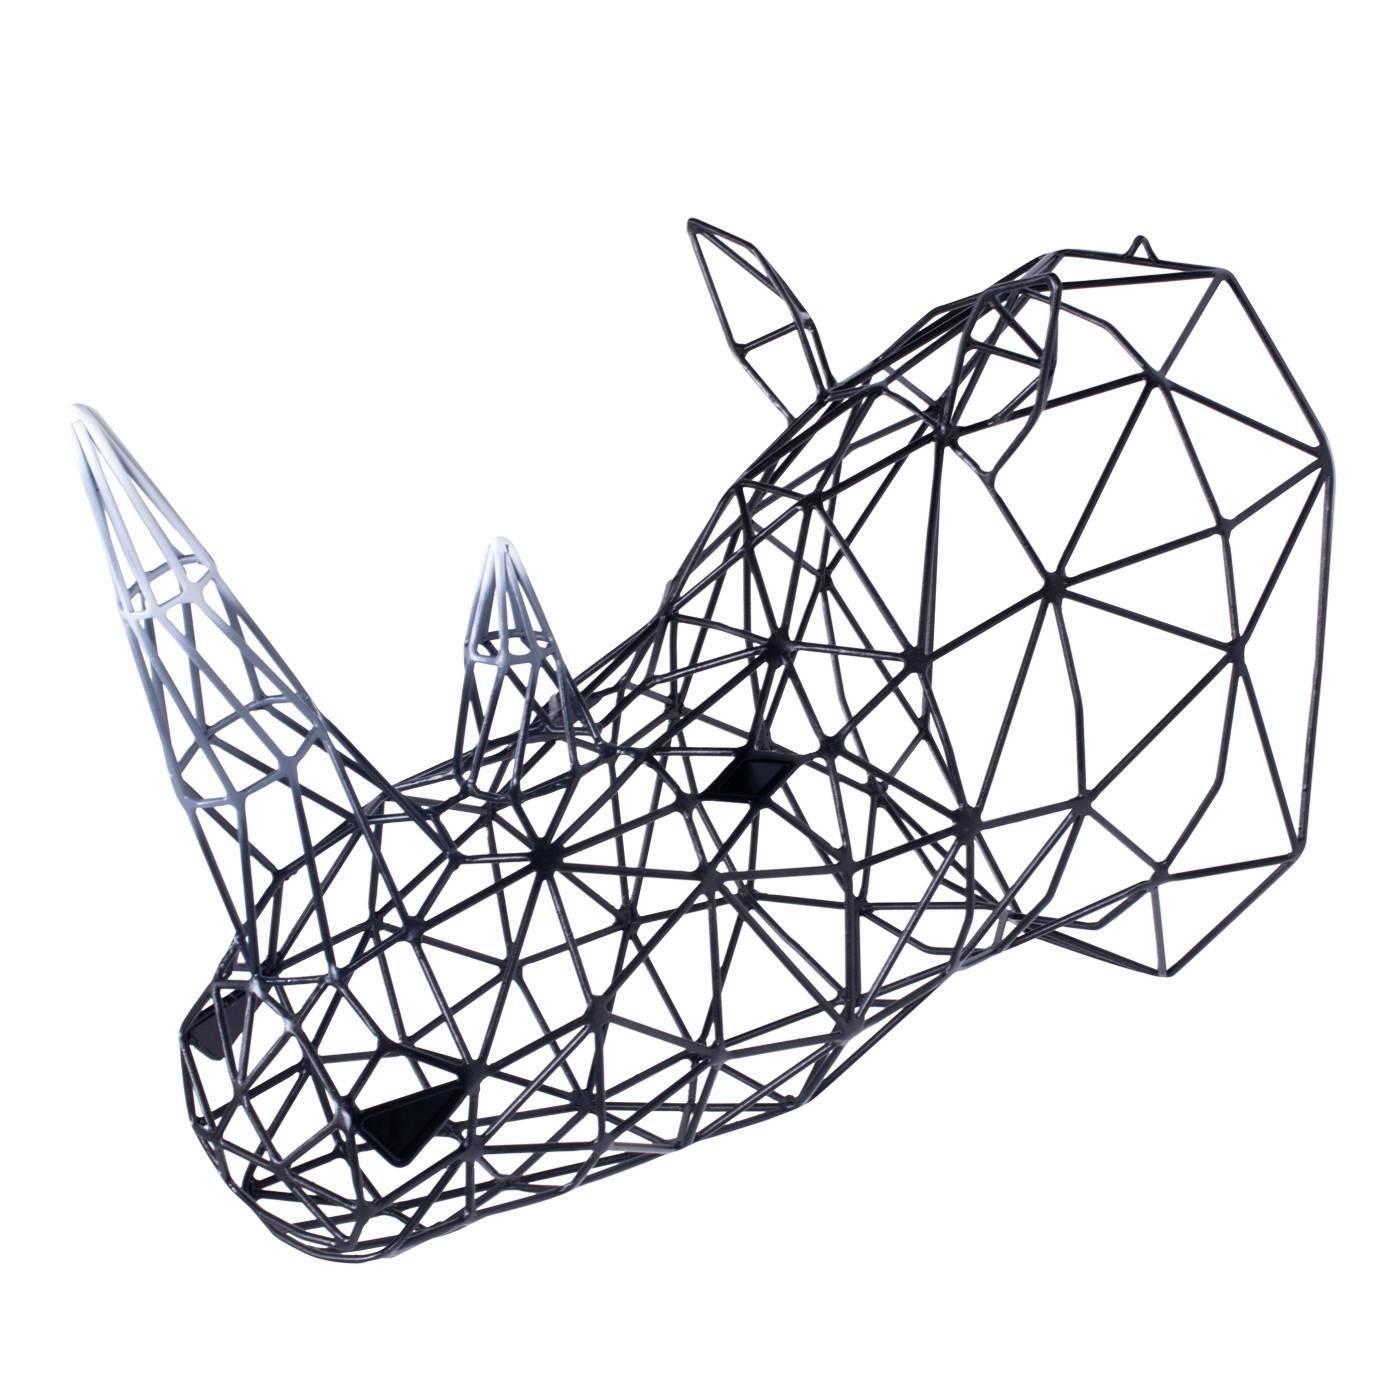 Black Rhino Head Iron Sculpture